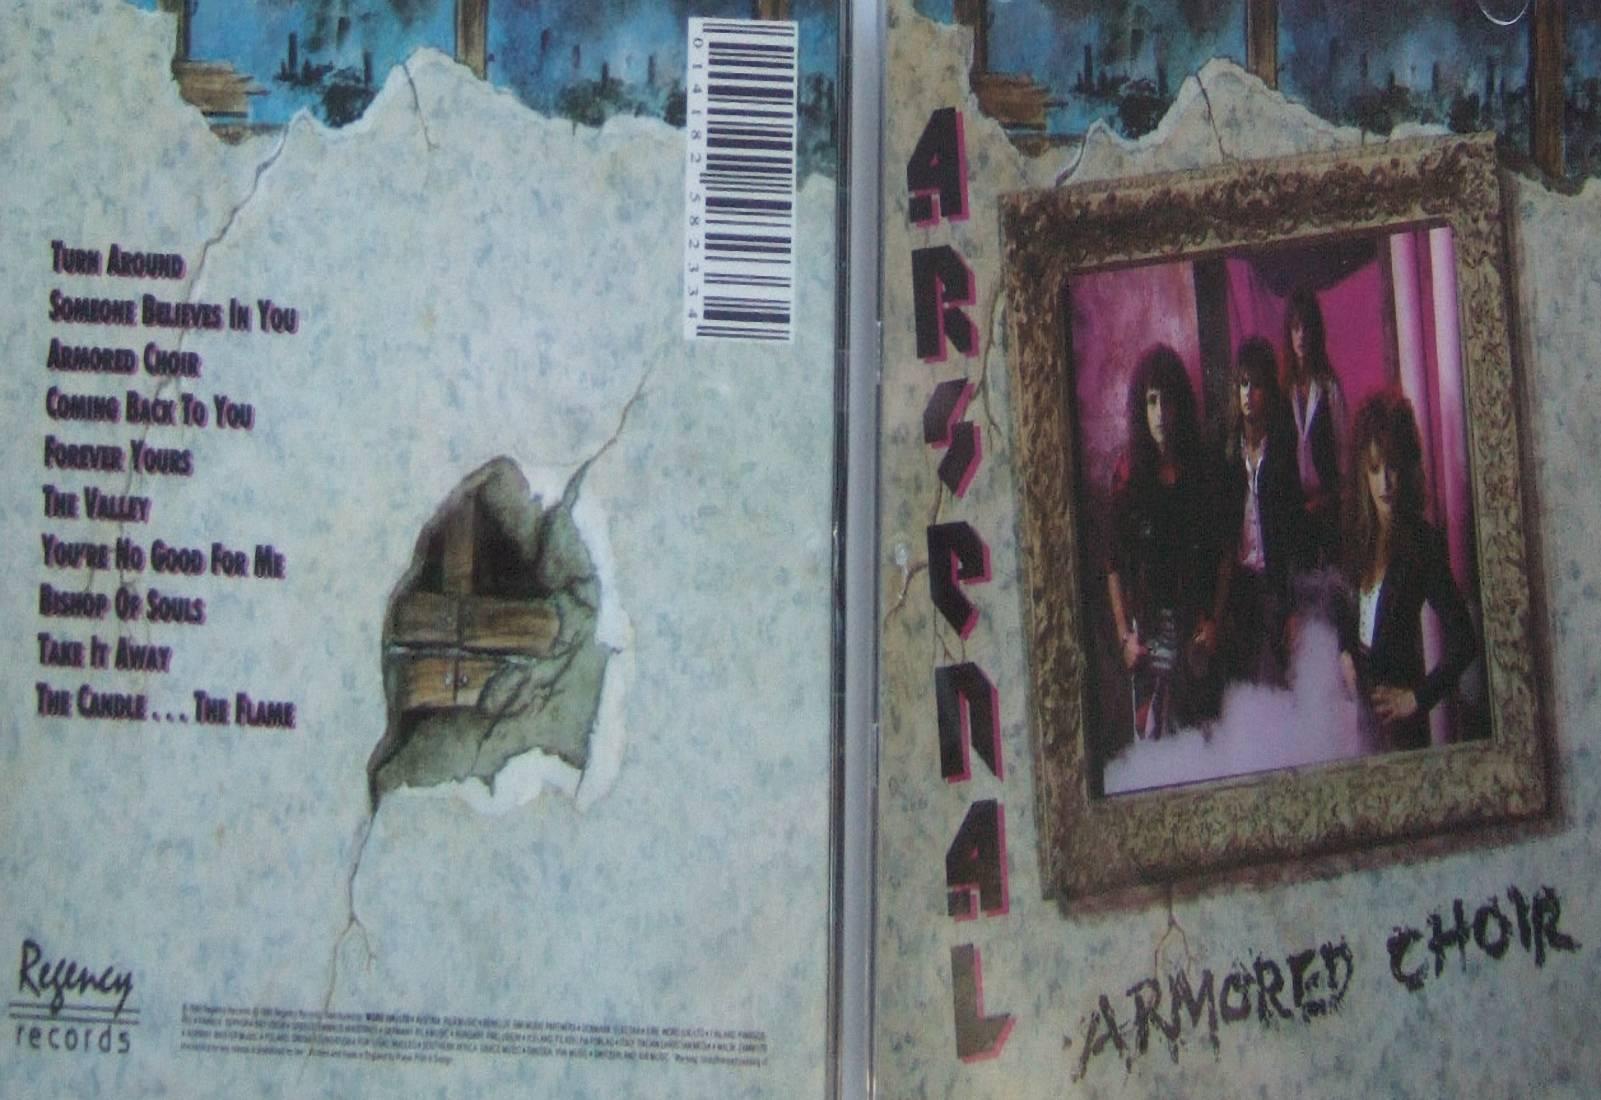 Arsenal - Armored Choir 1990